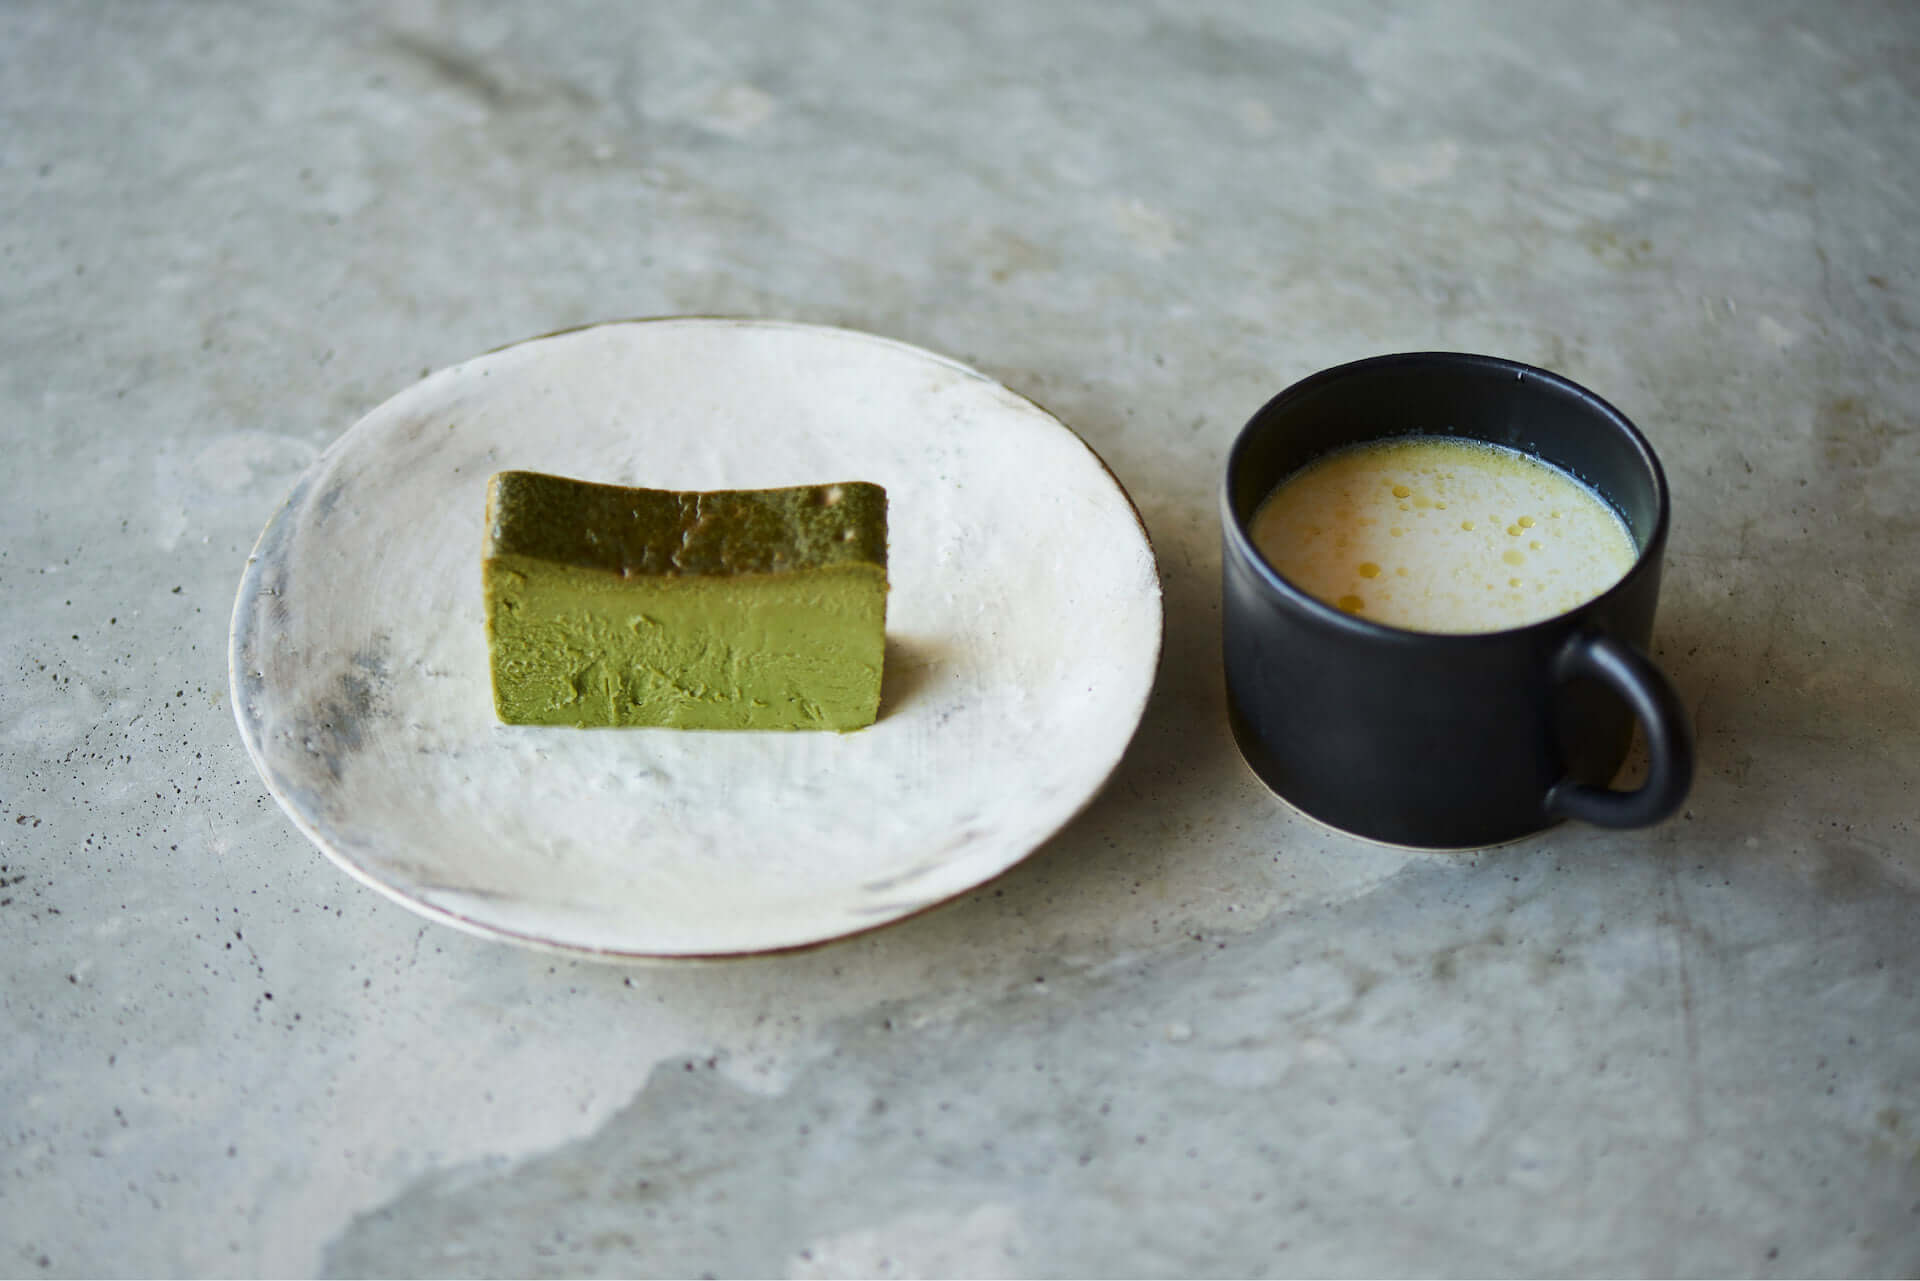 Mr. CHEESECAKE誕生3周年記念!希少な抹茶を使用したチーズケーキ『Mr. CHEESECAKE Oribe』が数量限定で登場 gourmet210322_mrcheesecake-tearoom_11-1920x1281